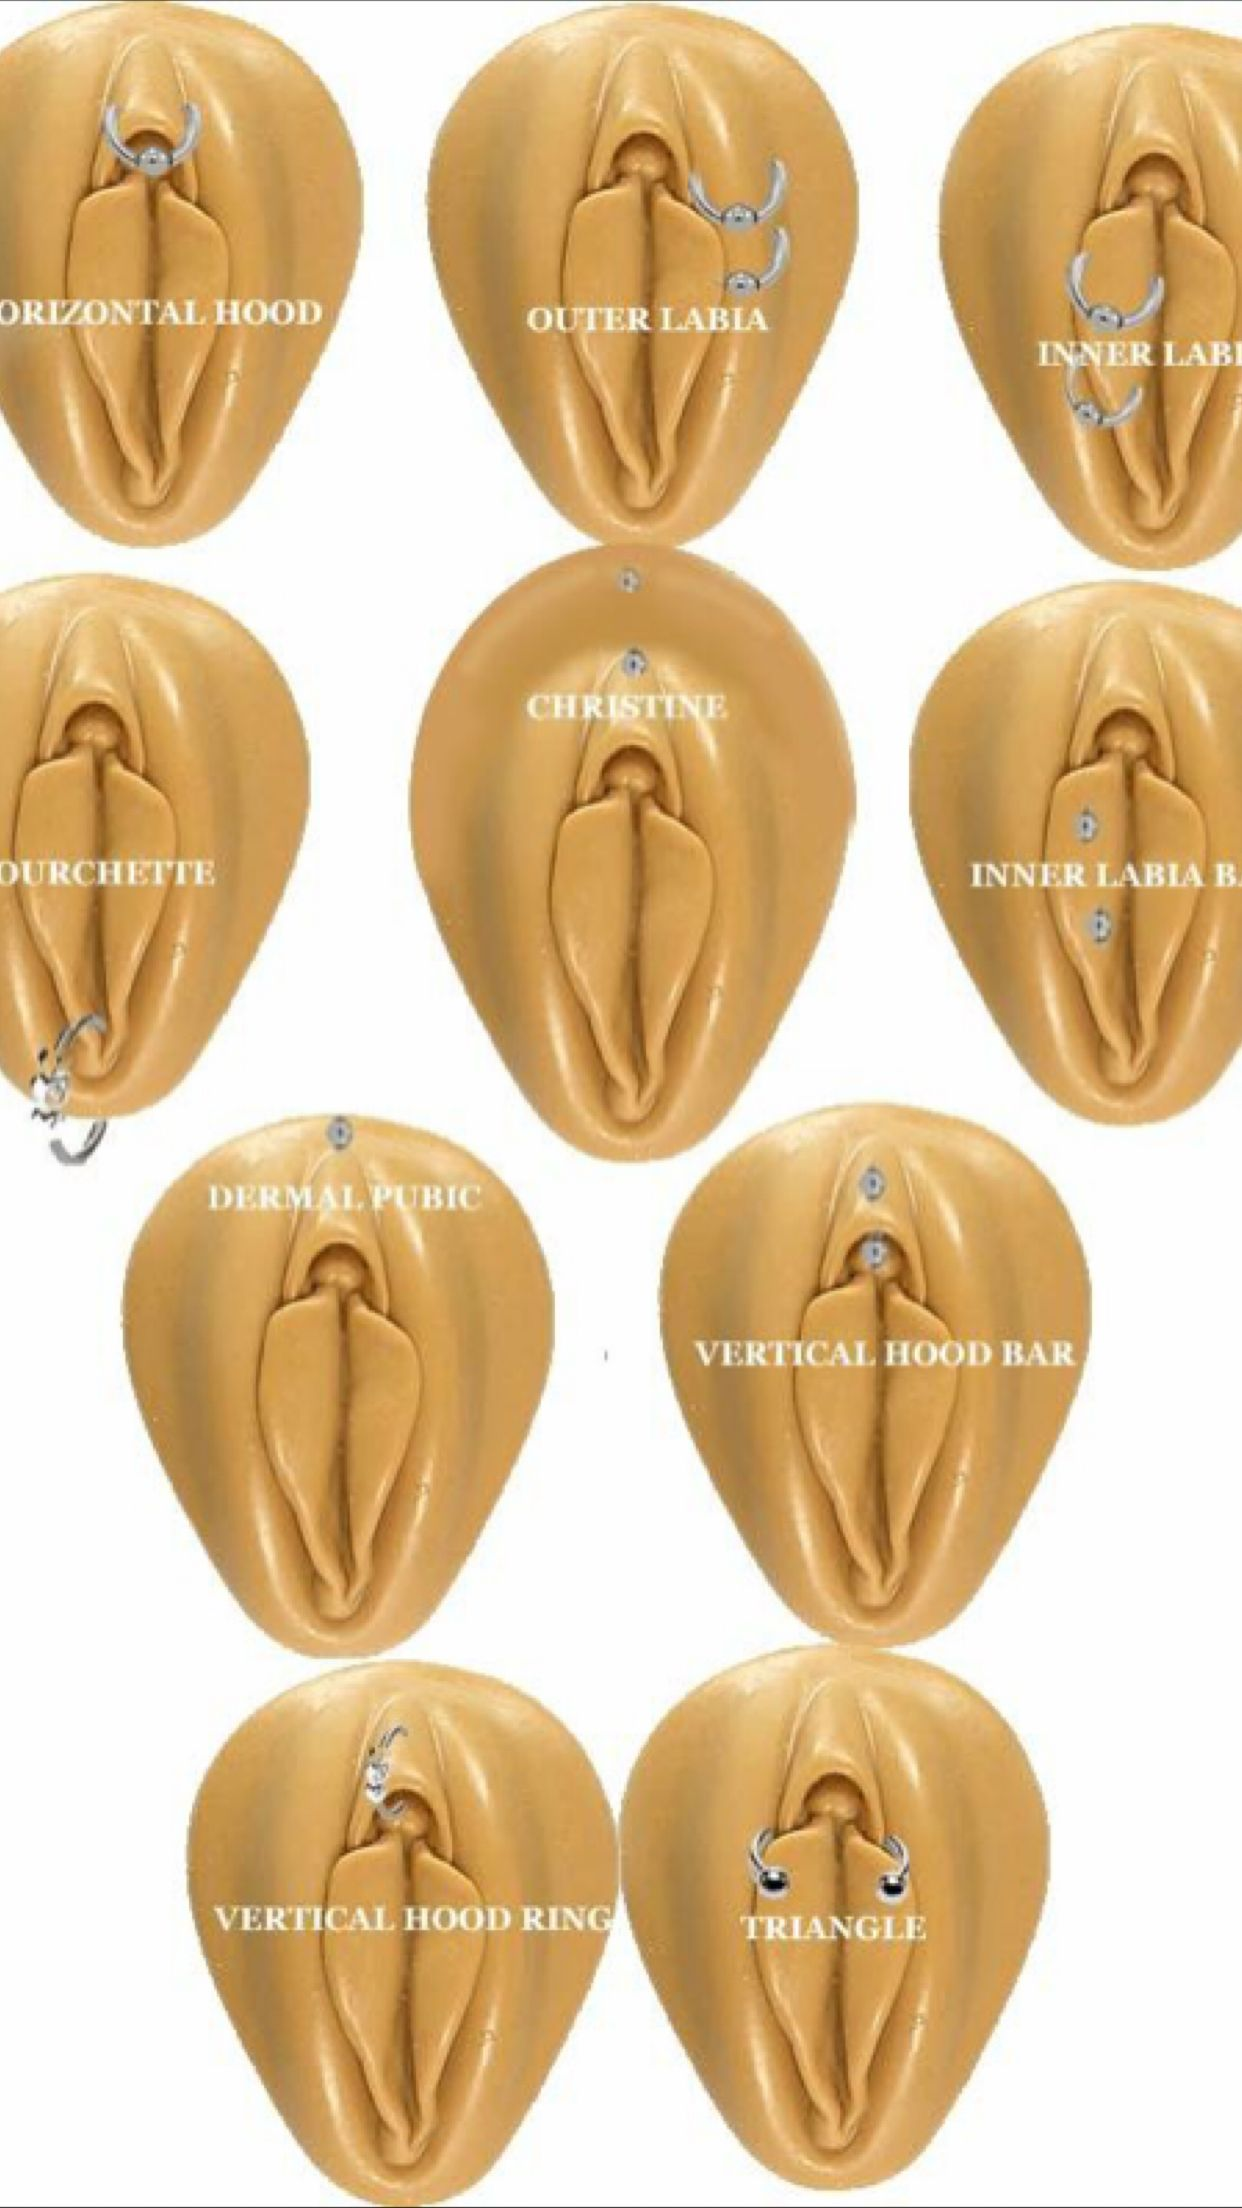 Different Ear Piercings Diagram Solar Energy How Does It Work Pin By Jelica Laraem On In 2018 Pinterest